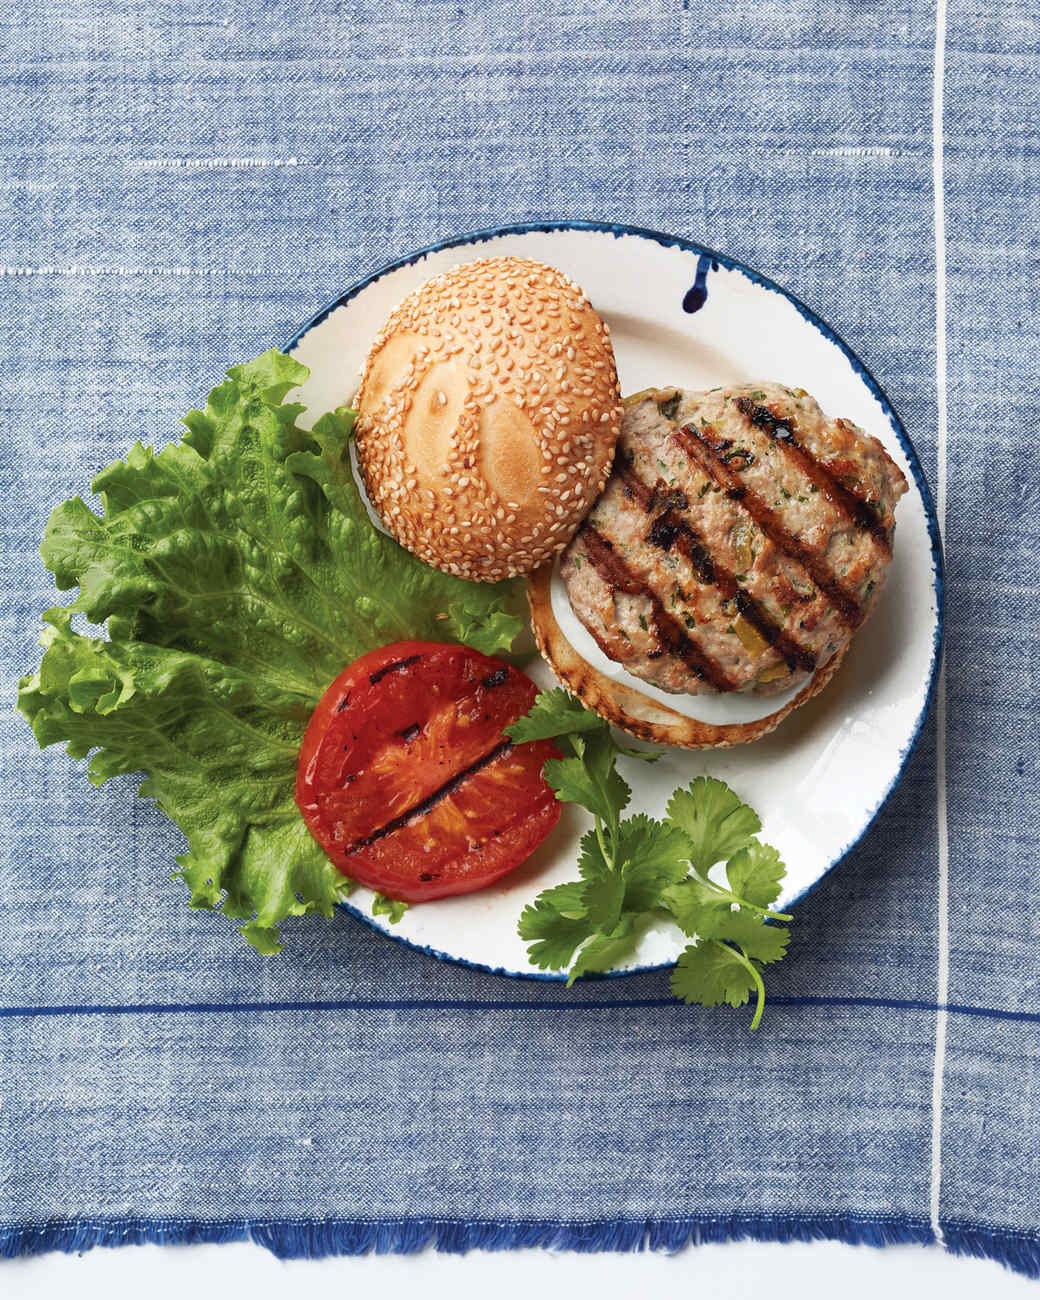 green-chili-turkey-burger-017-d112910.jpg